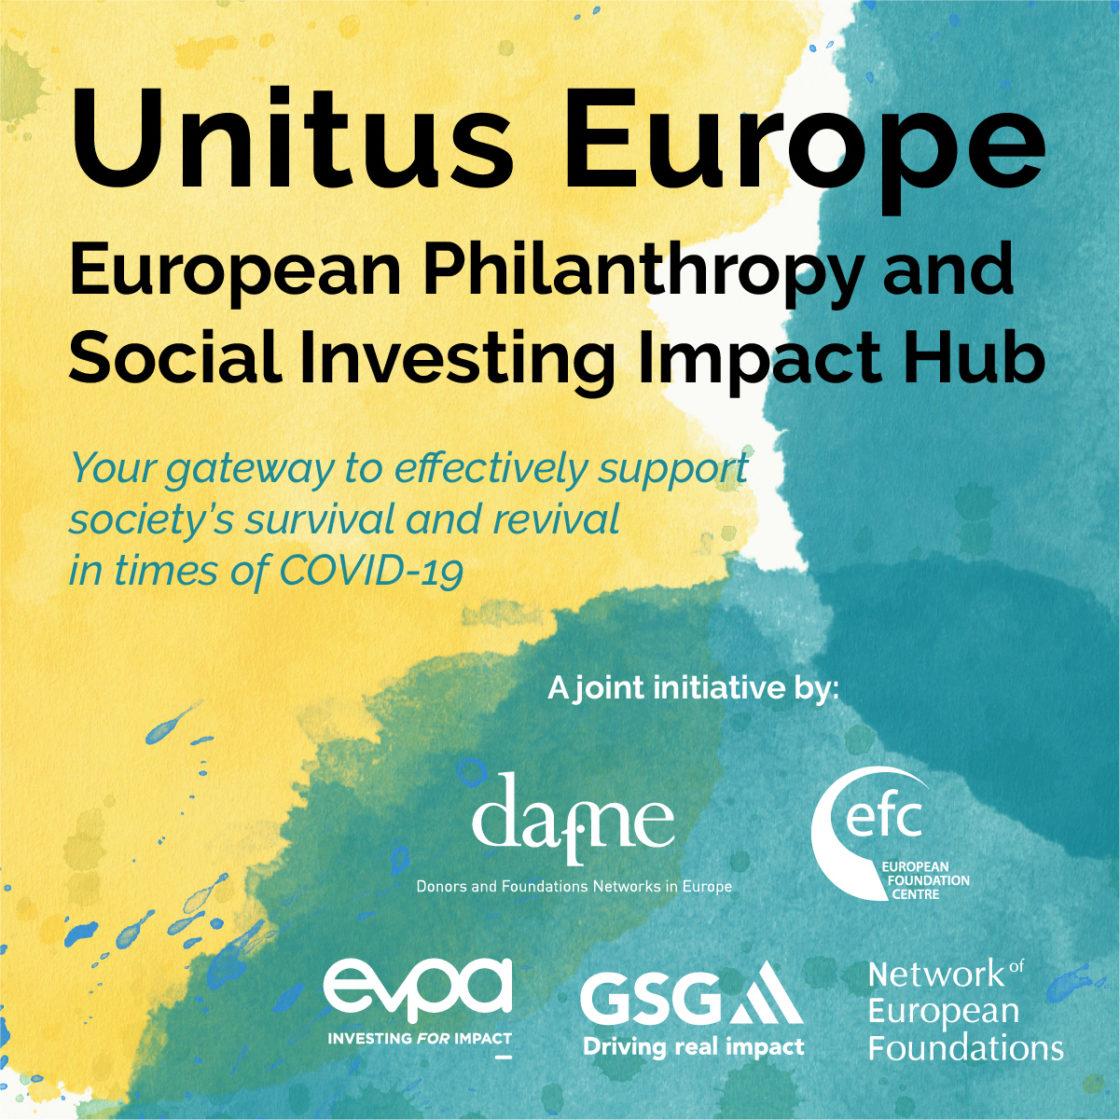 Introducing Unitus Europe – the new European Philanthropy and Social Investing Impact Hub